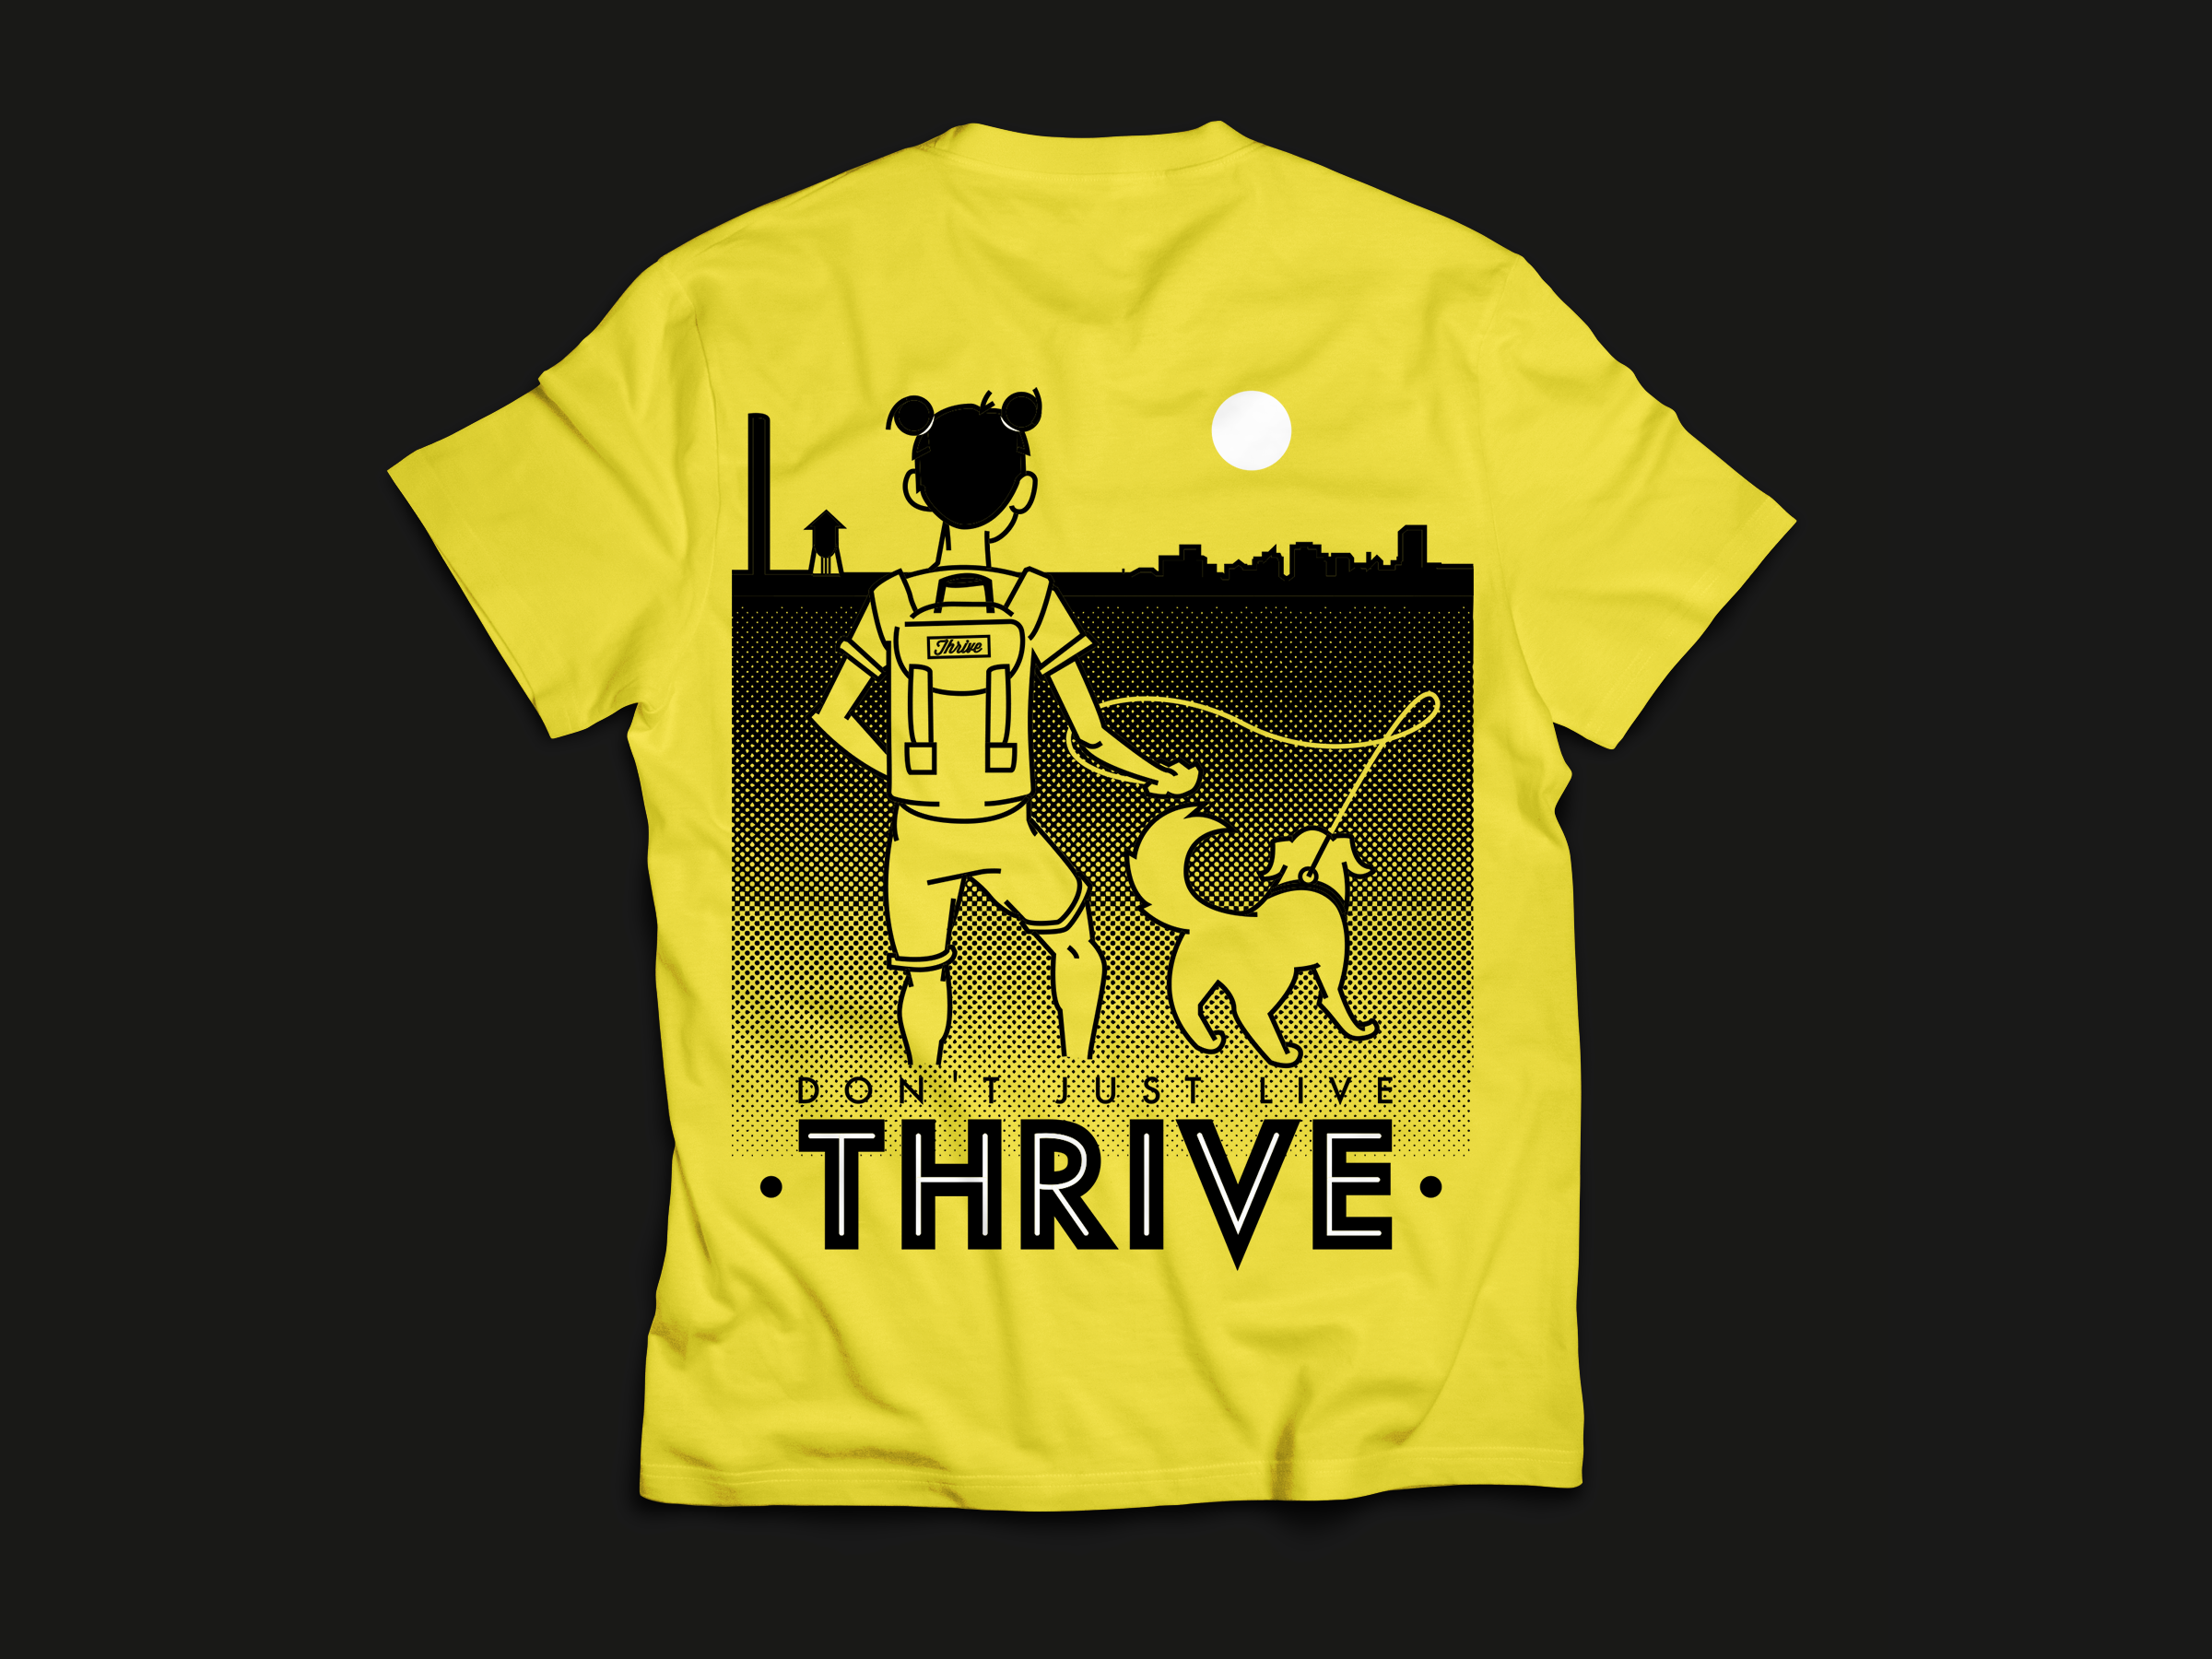 thriveshirtBACK.png